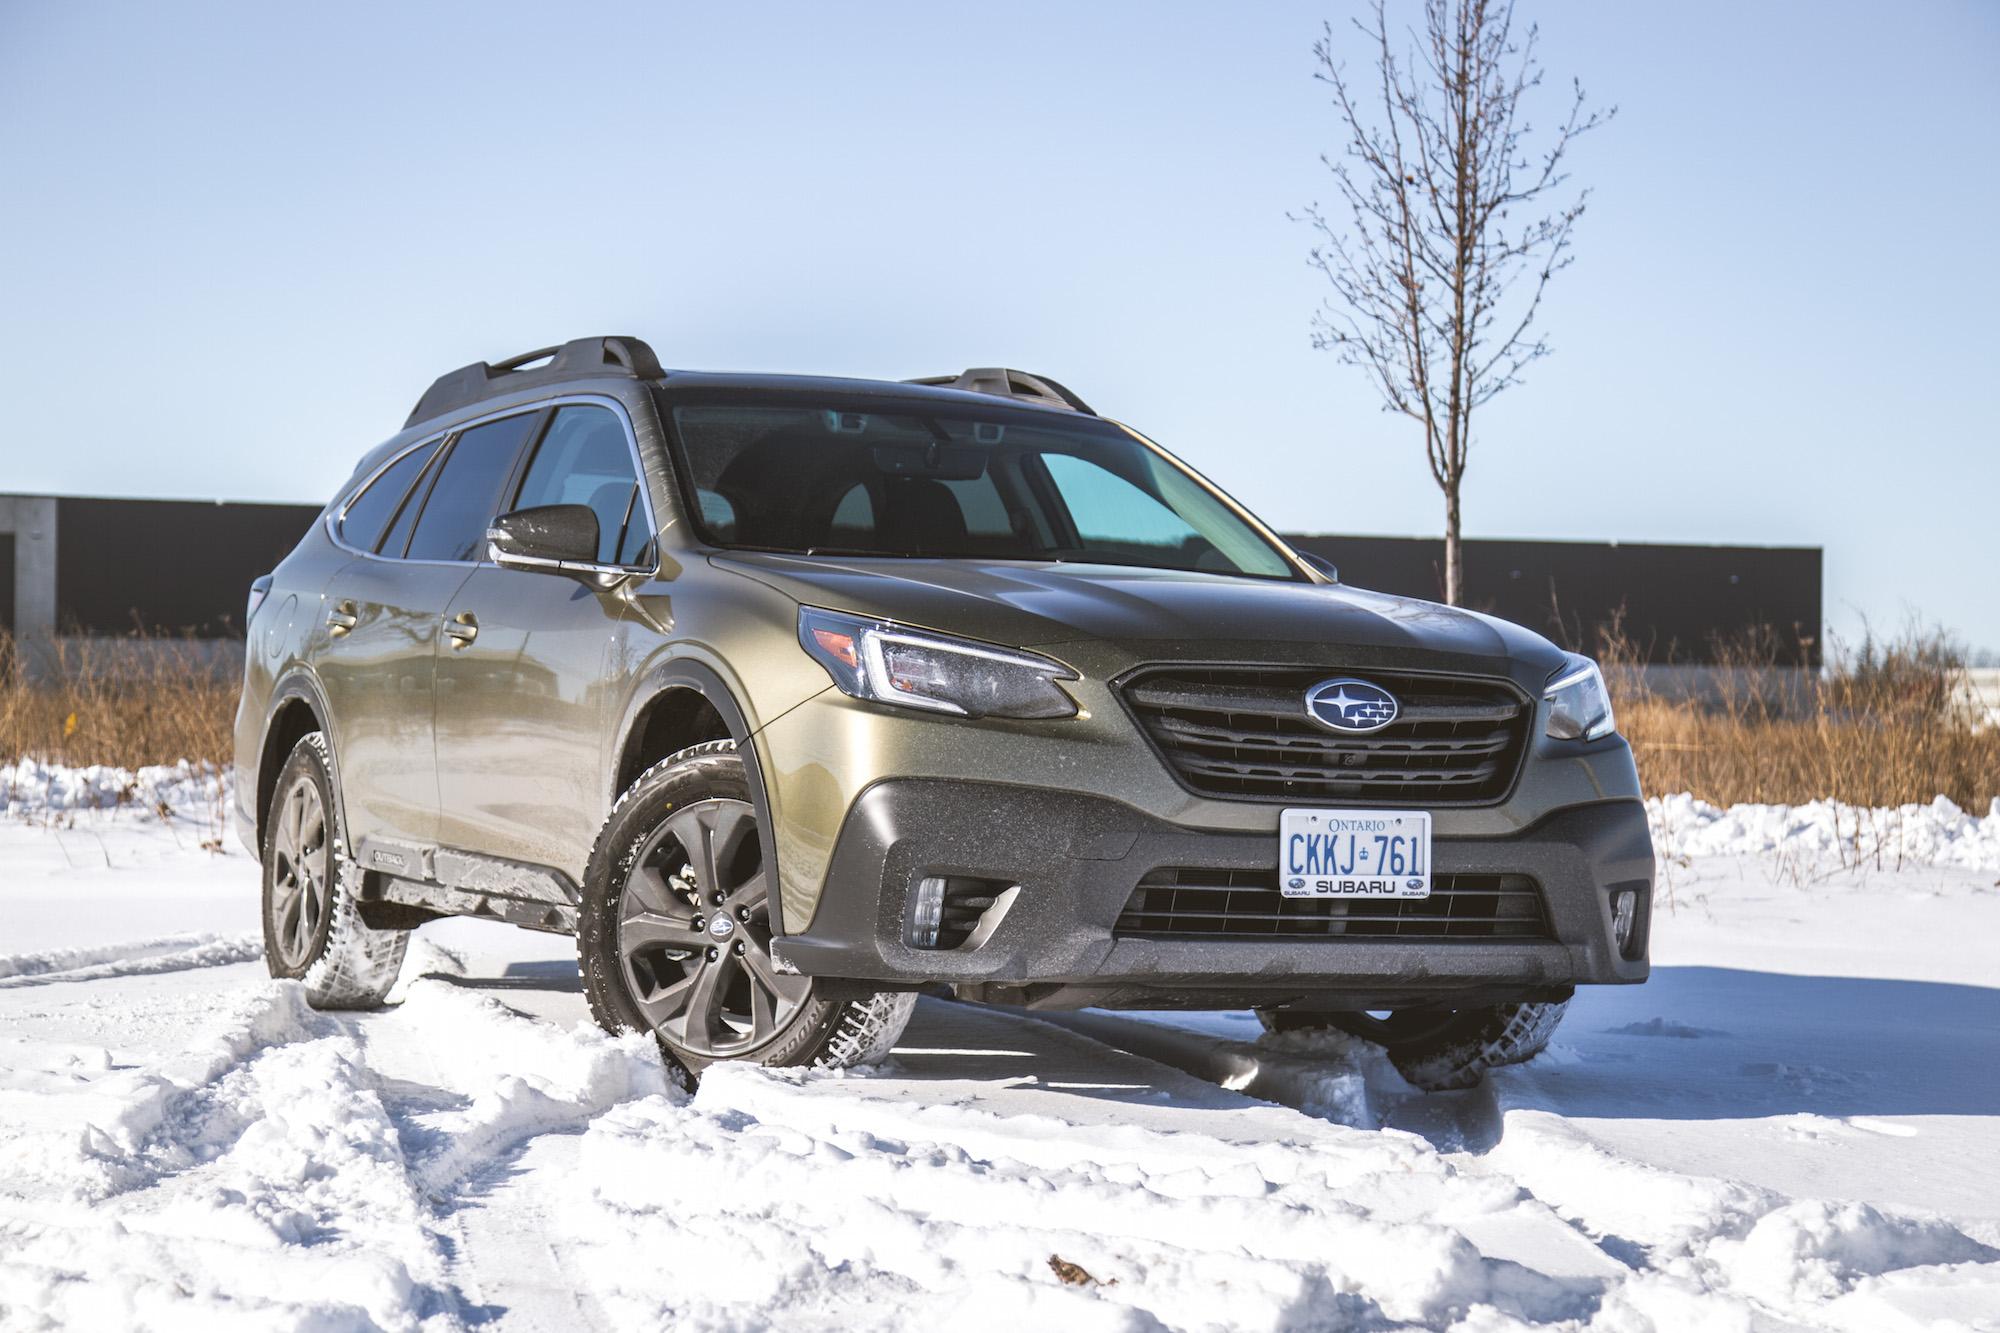 Review 2020 Subaru Outback Outdoor Xt Car